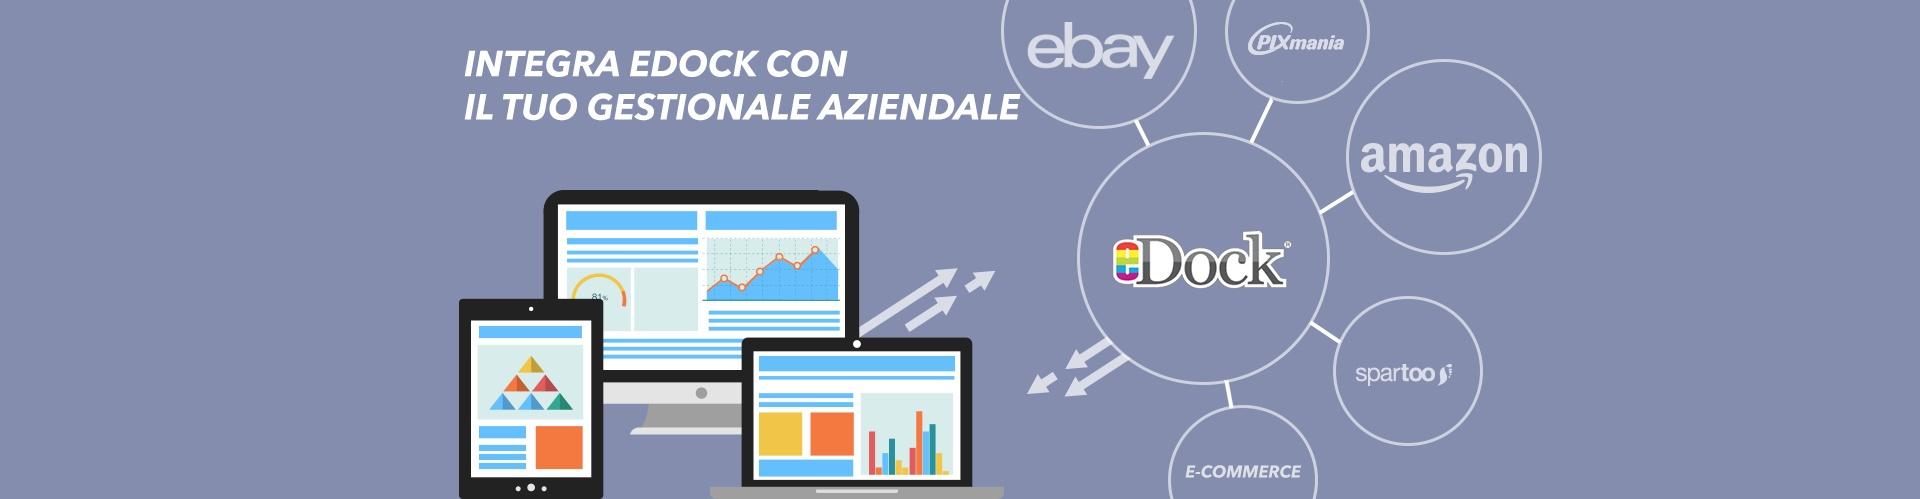 gestionali_banner.jpg